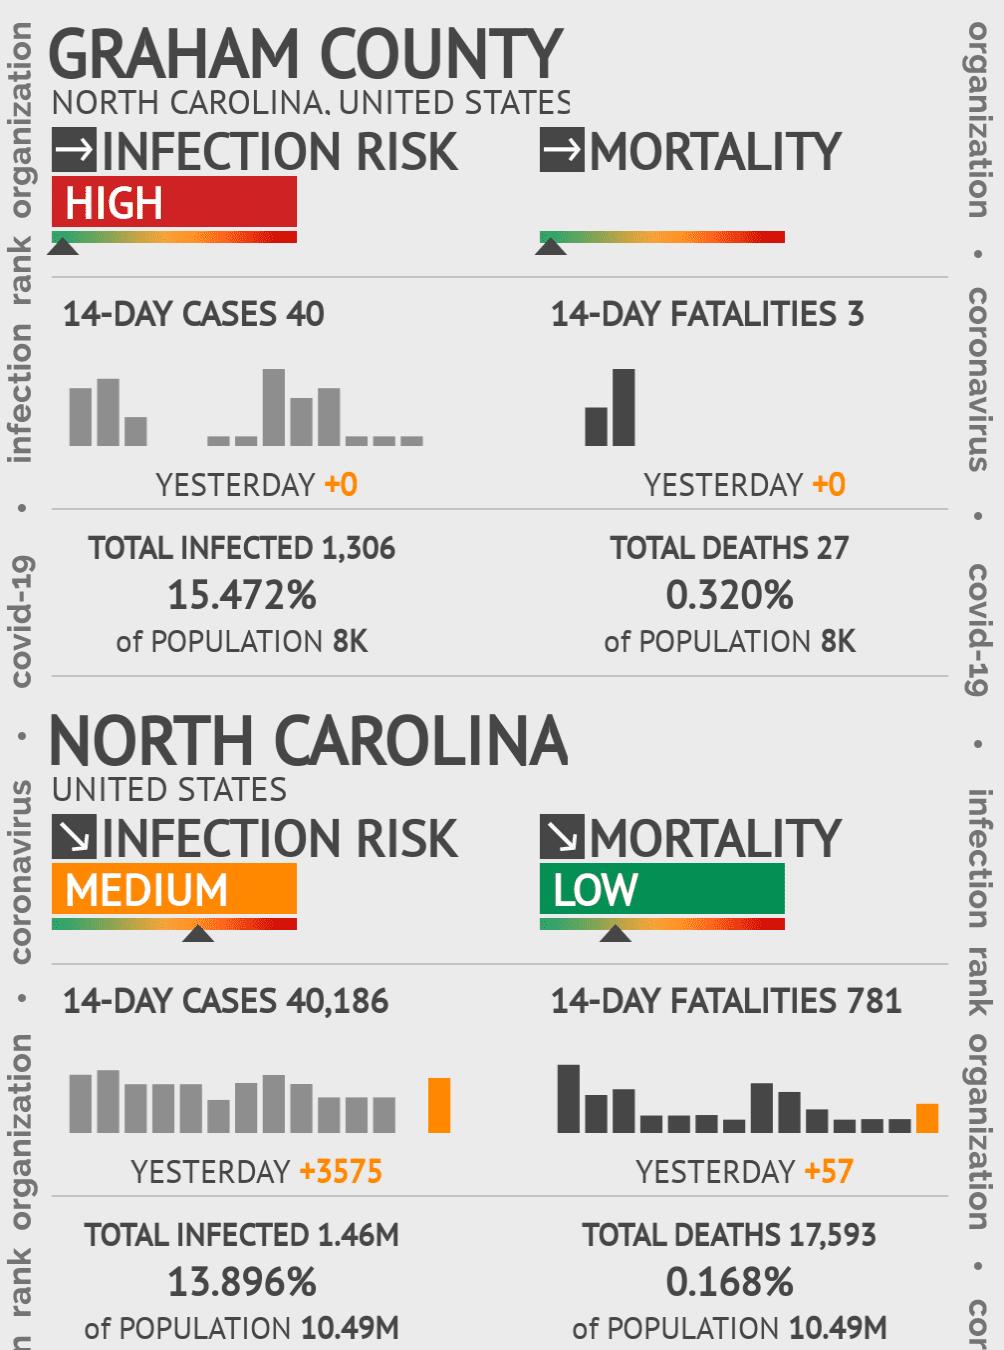 Graham County Coronavirus Covid-19 Risk of Infection on July 24, 2021